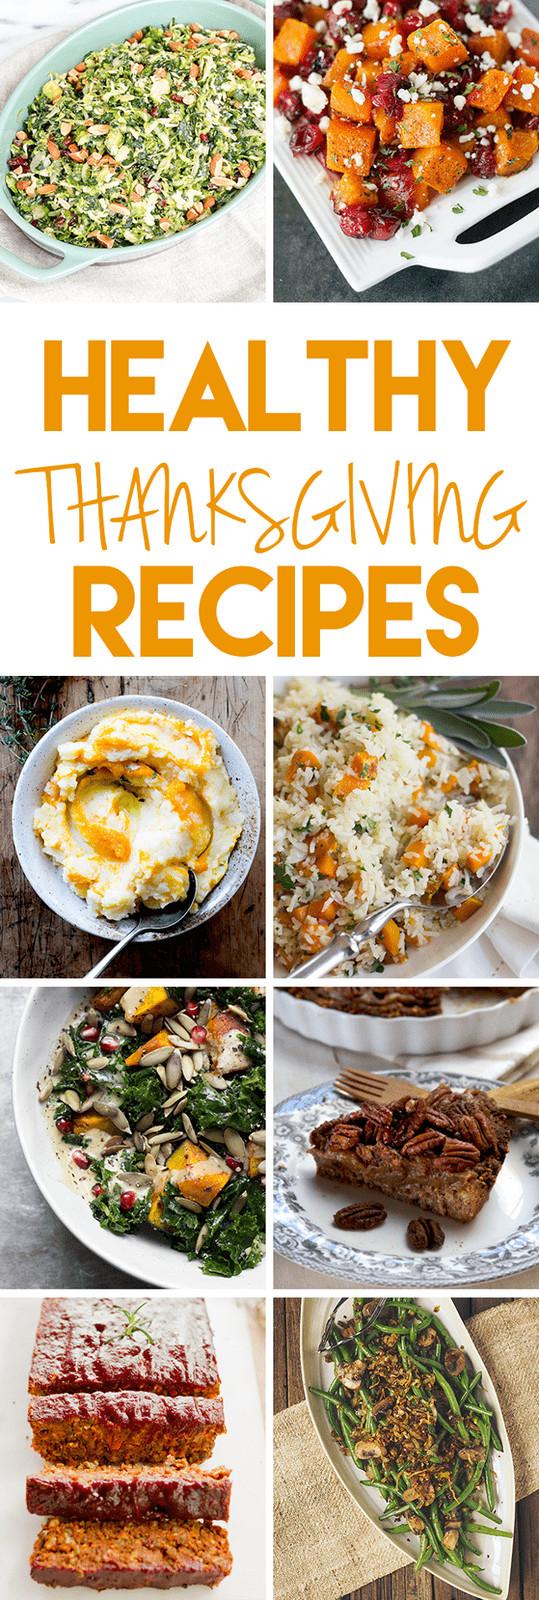 Healthy Thanksgiving Turkey Recipes  Healthy Thanksgiving Recipes gluten free ve arian